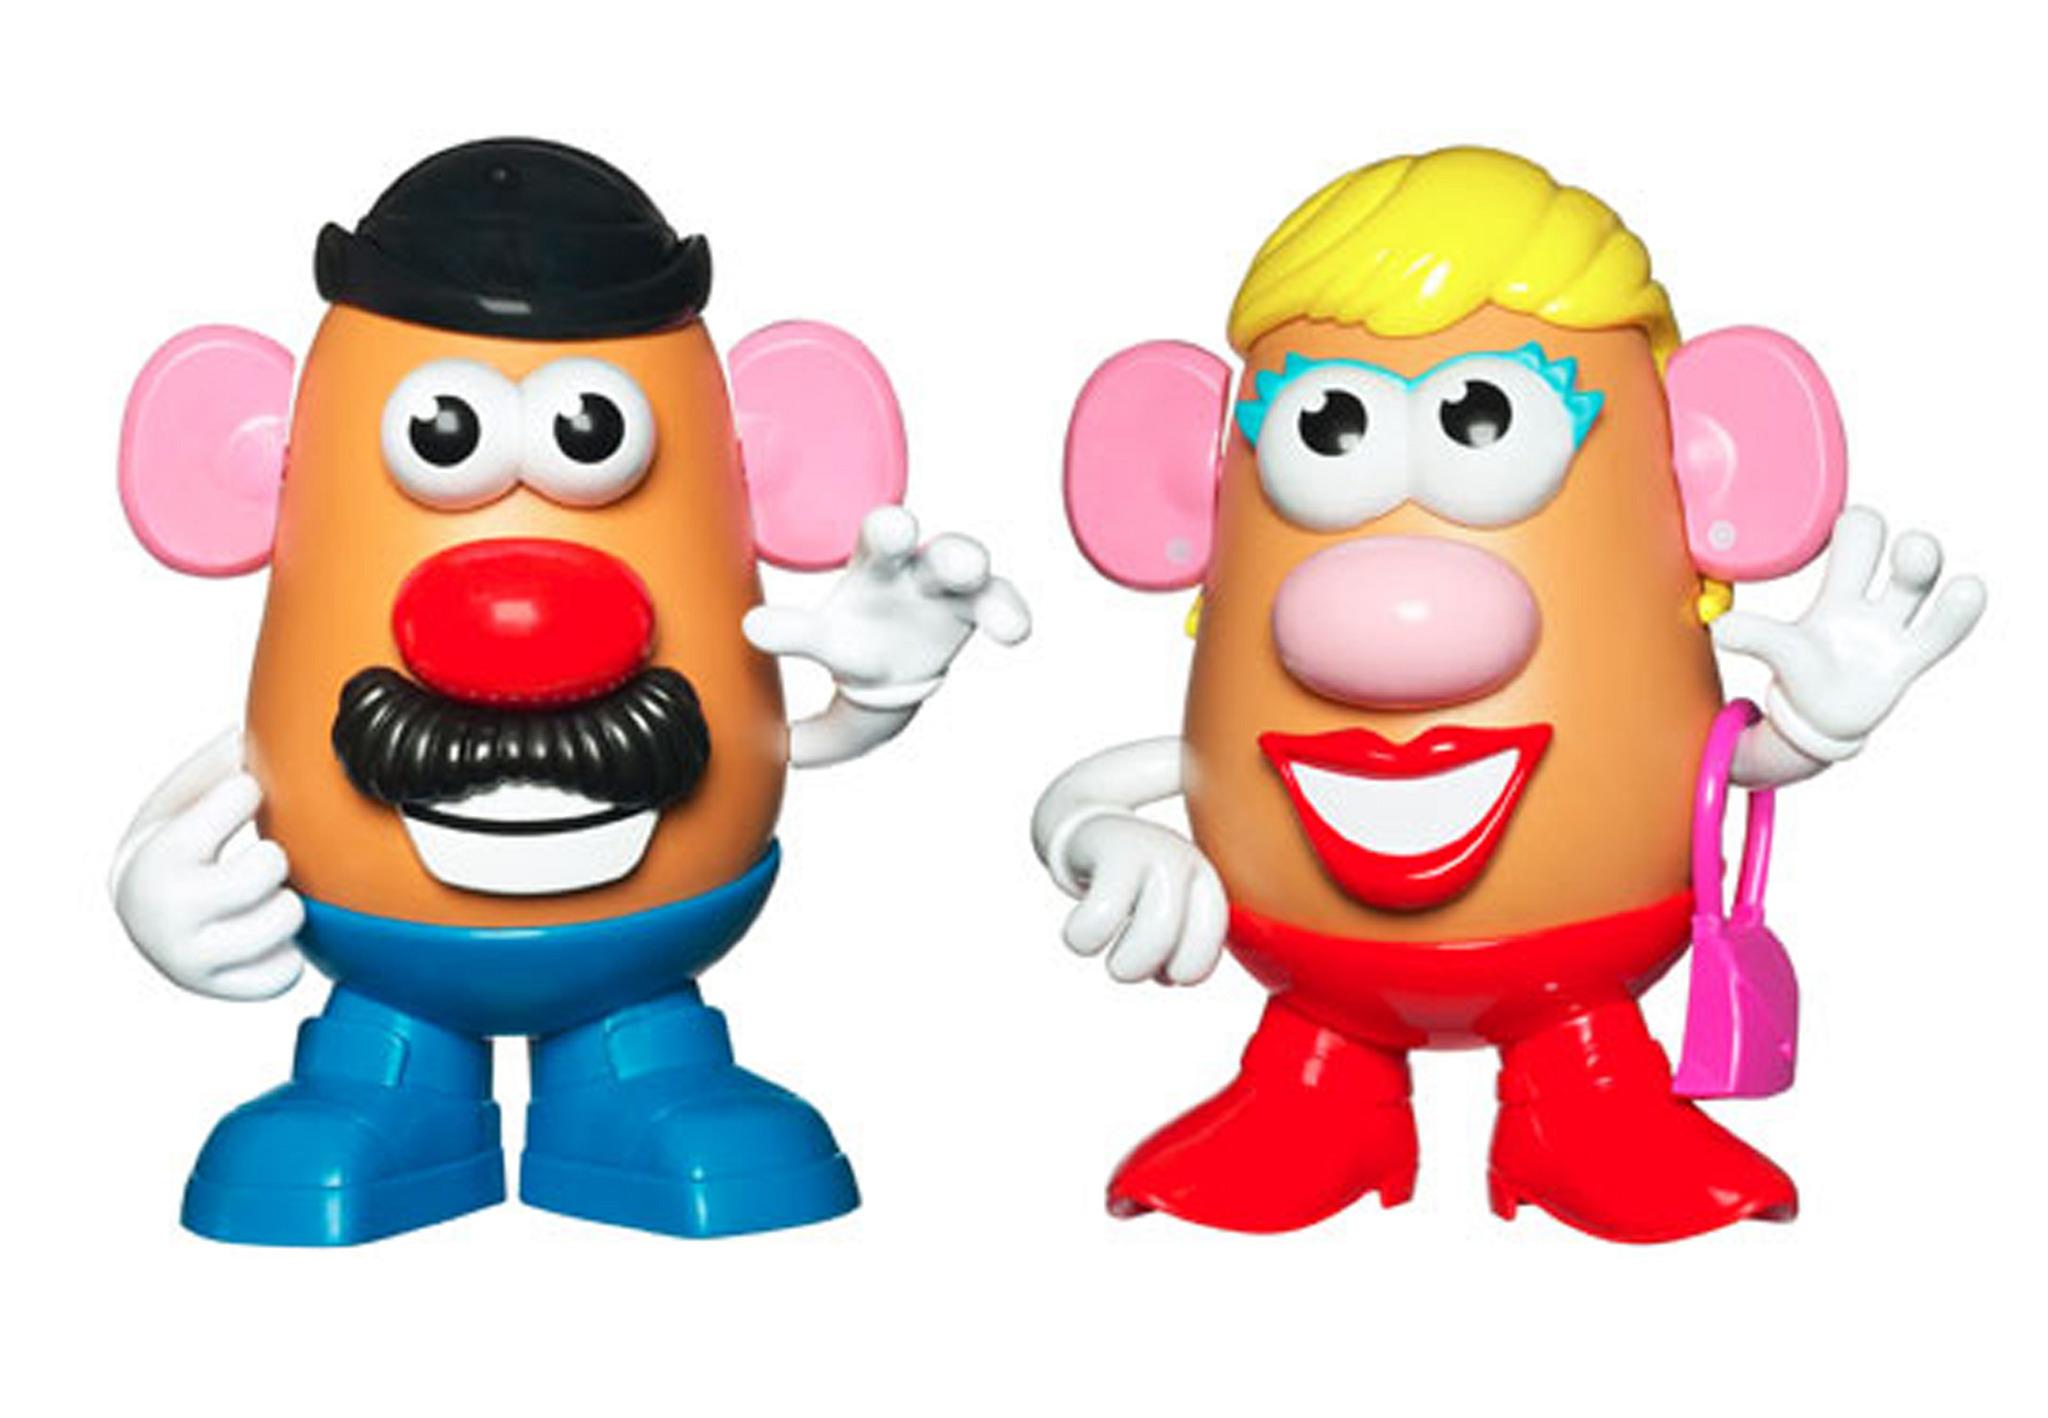 Mr-Mrs-Potato-Head-Hasbro-1.jpg